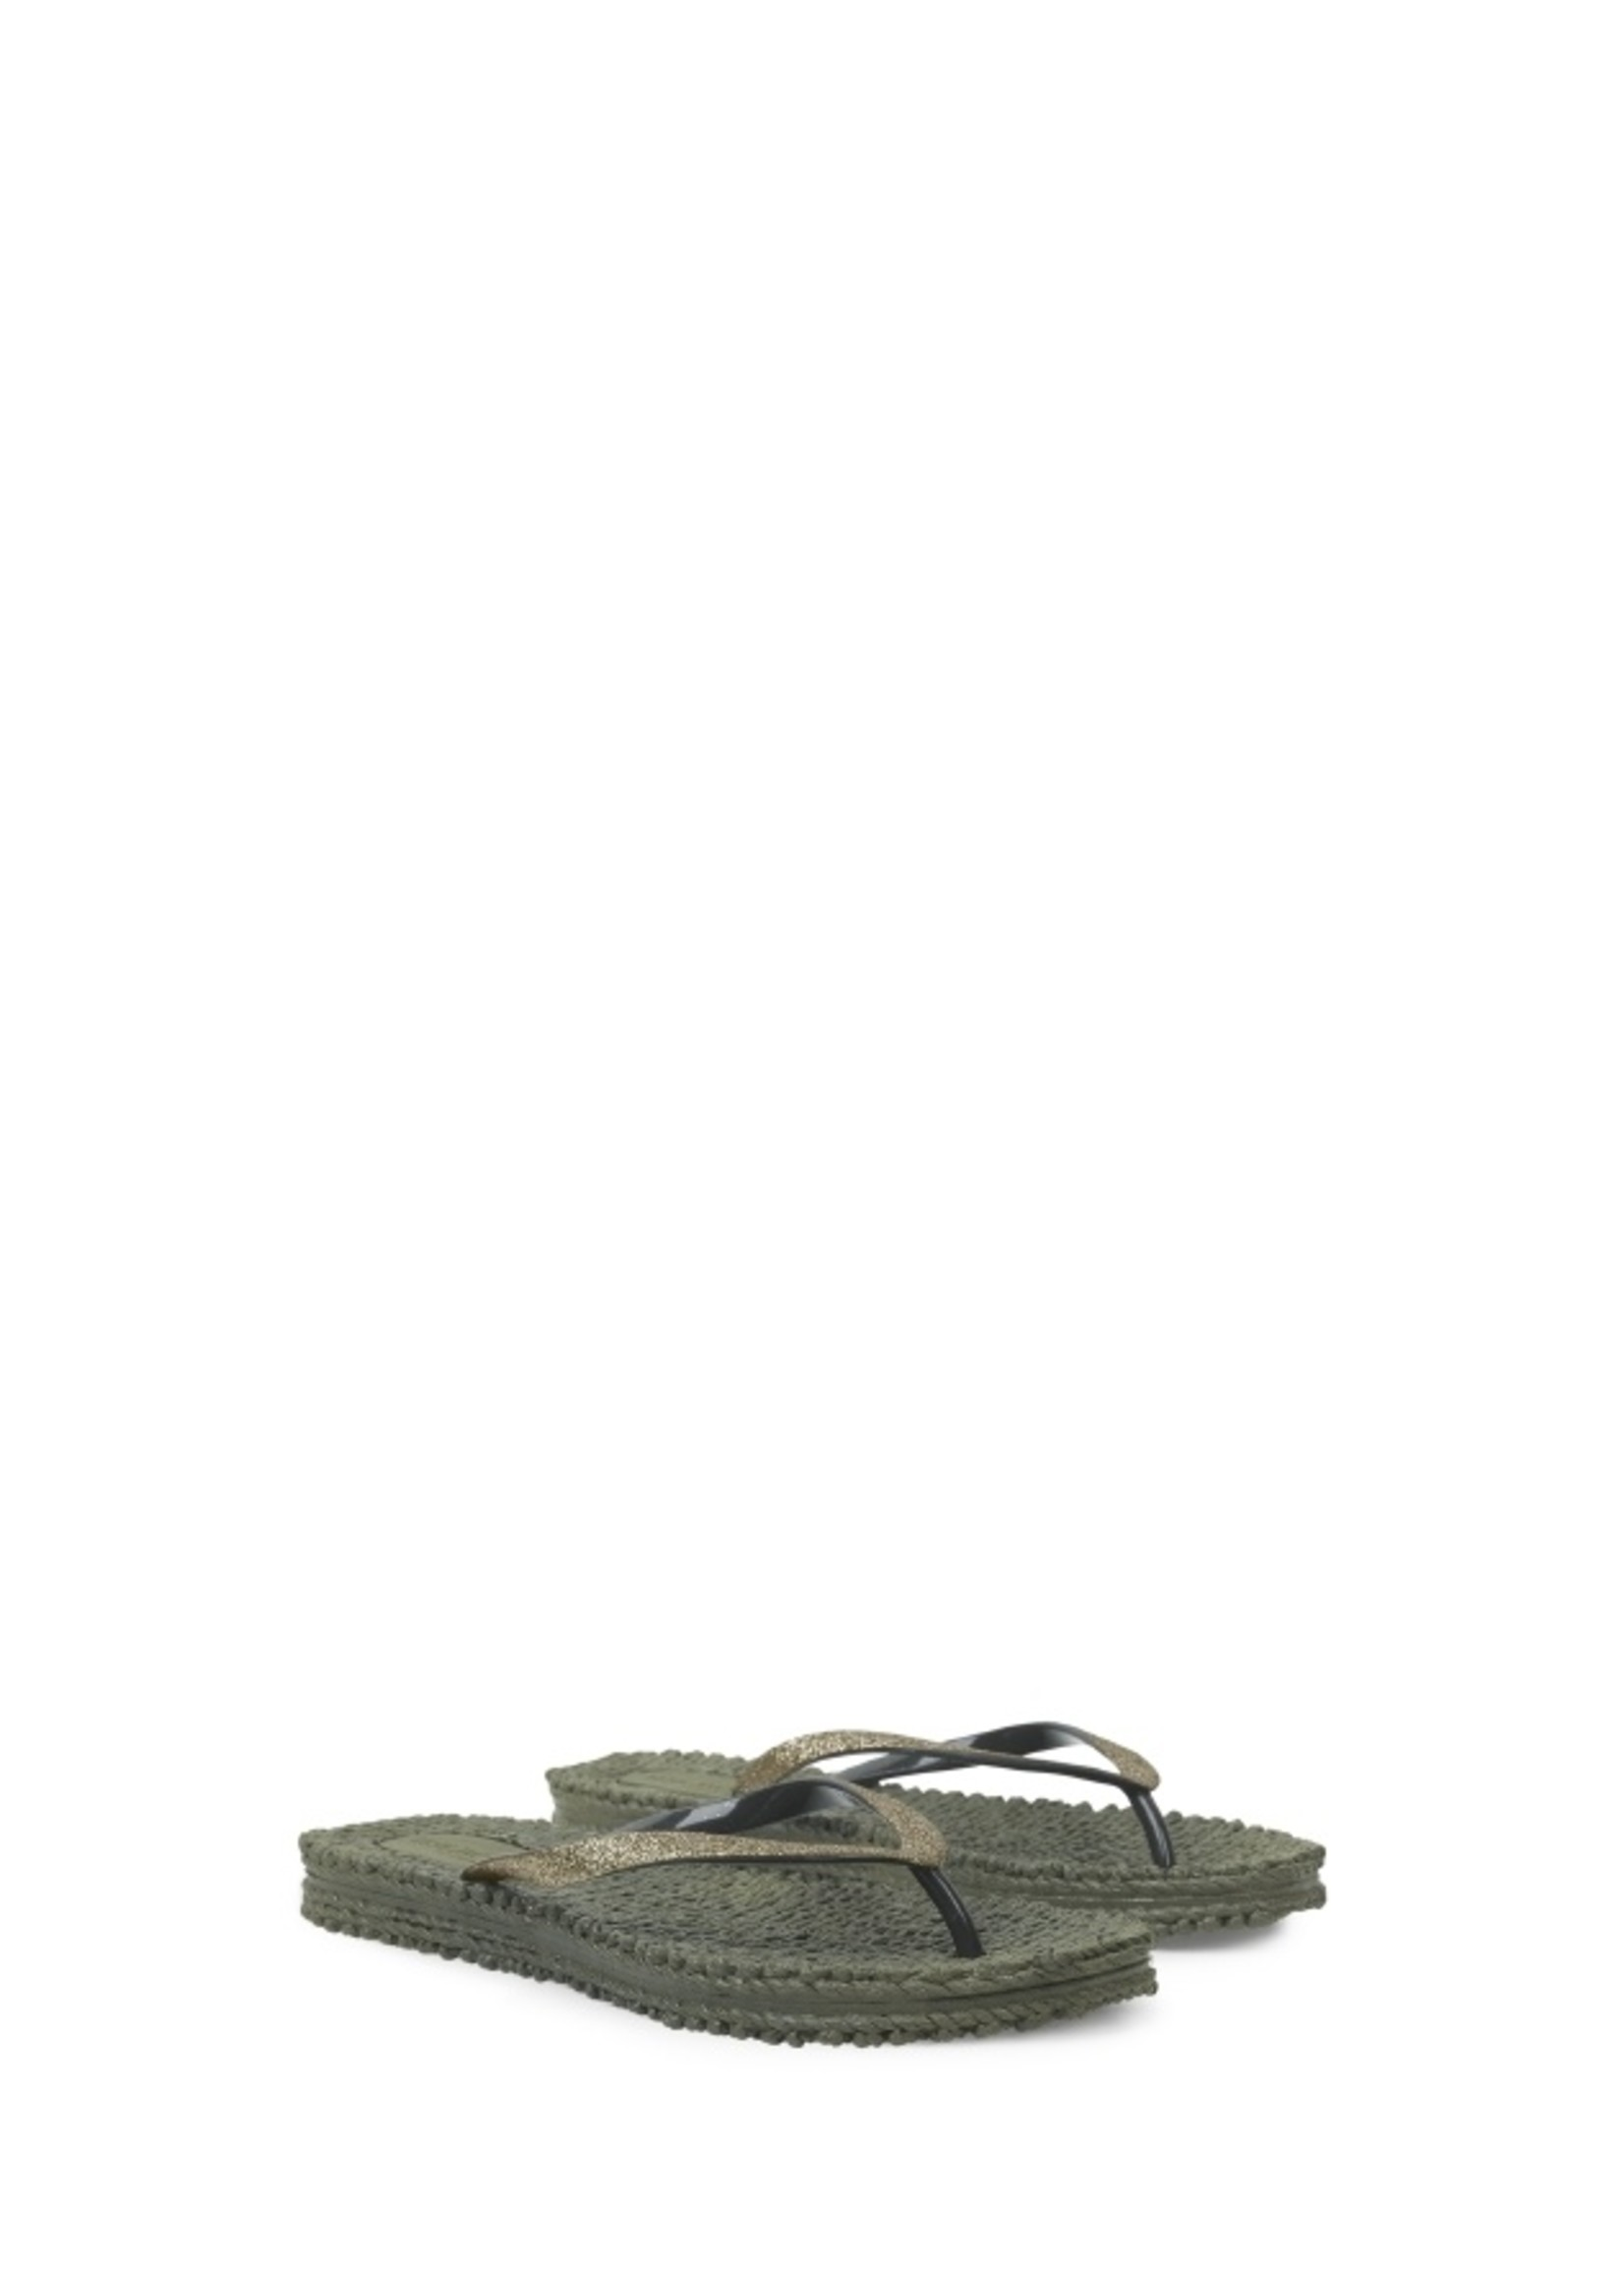 Ilse Jacobsen Cheerful Flip Flop - Army 41